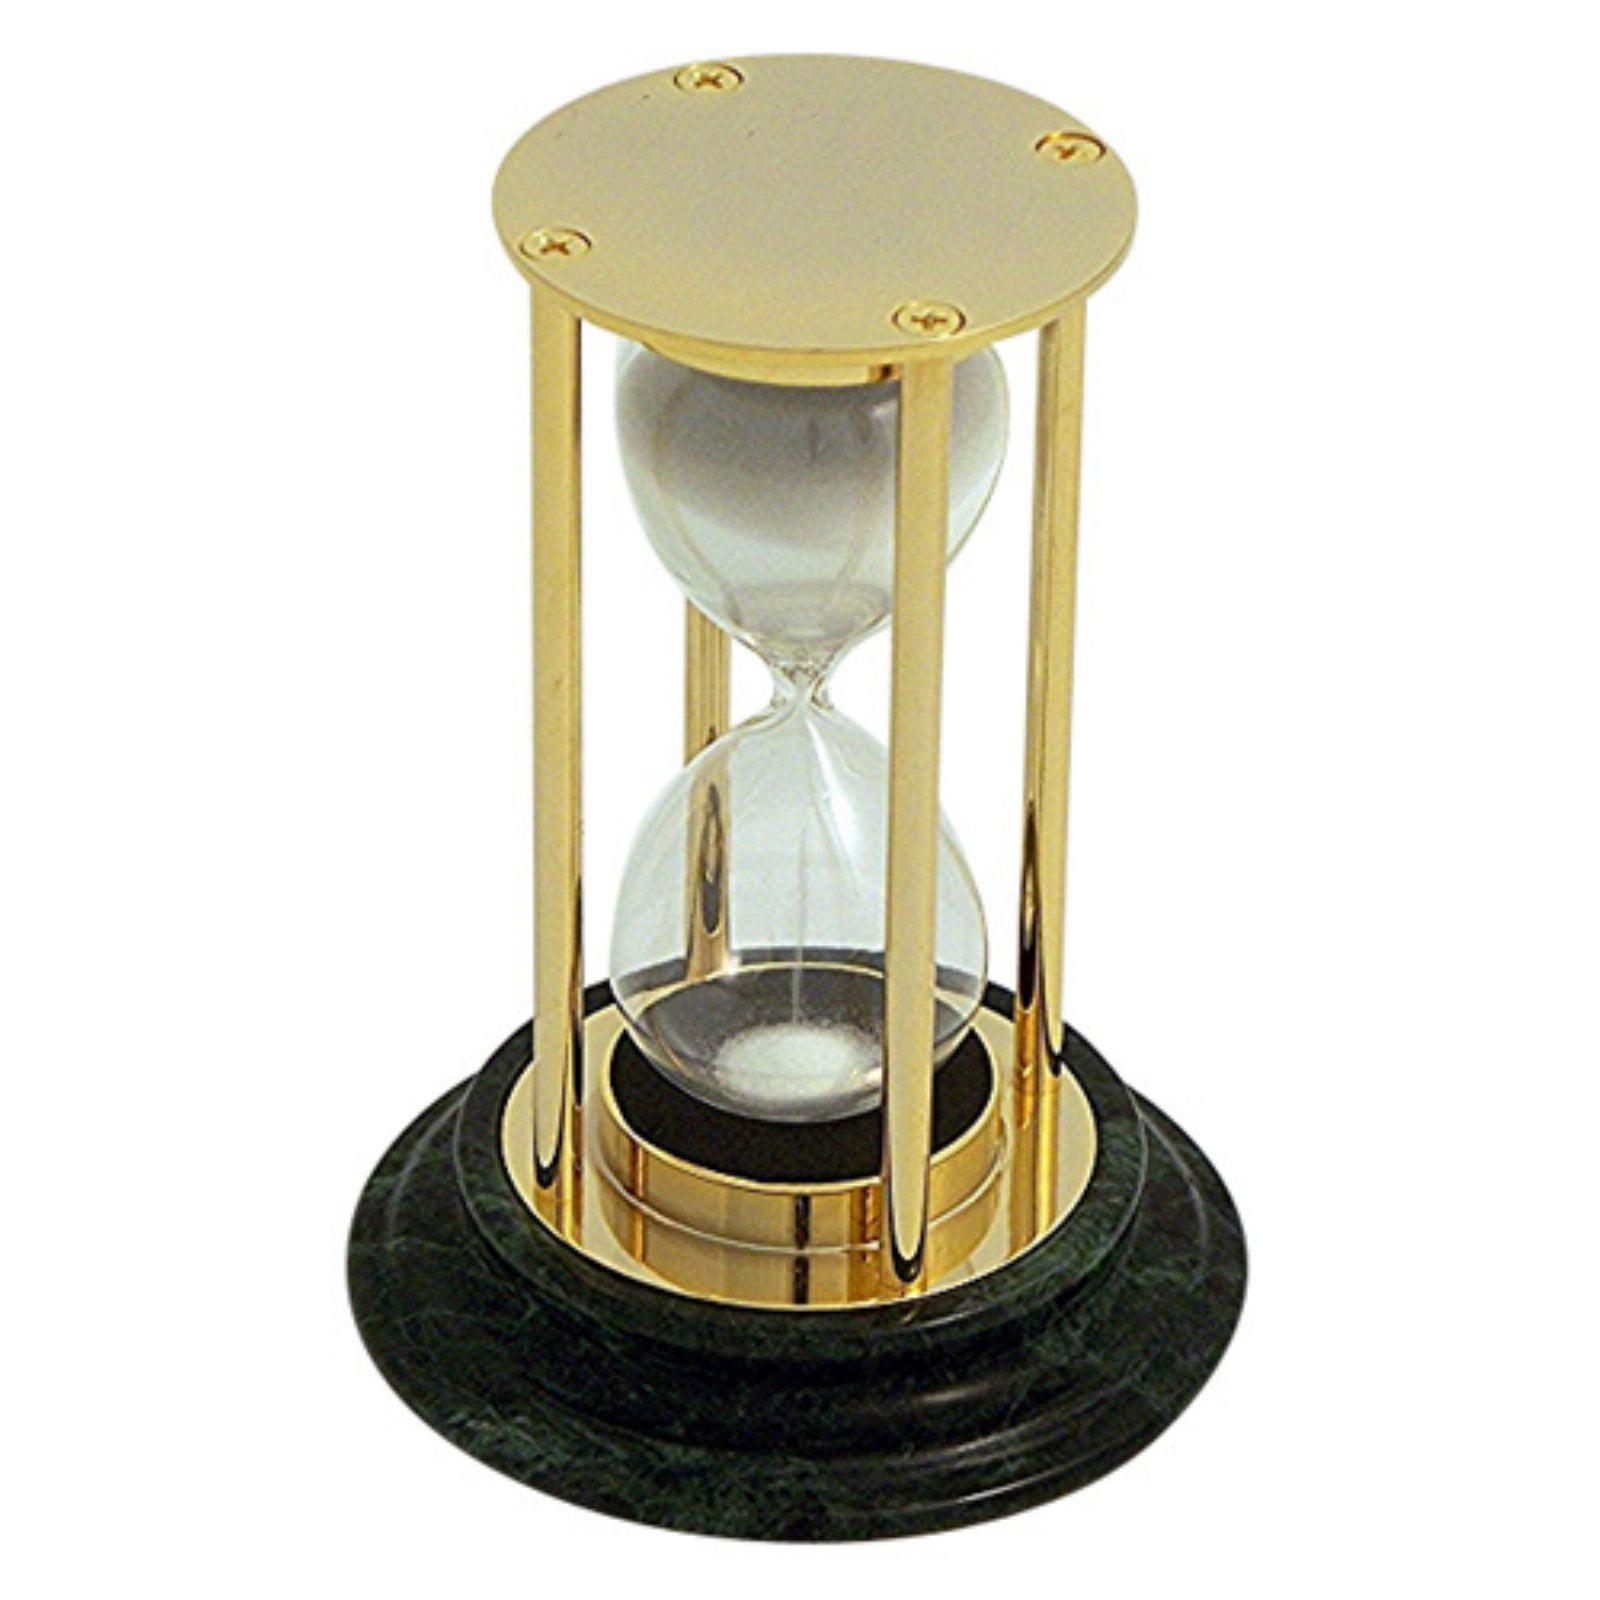 Bey Berk Brass / Green Marble 15 Minute Sand Timer - White Sand